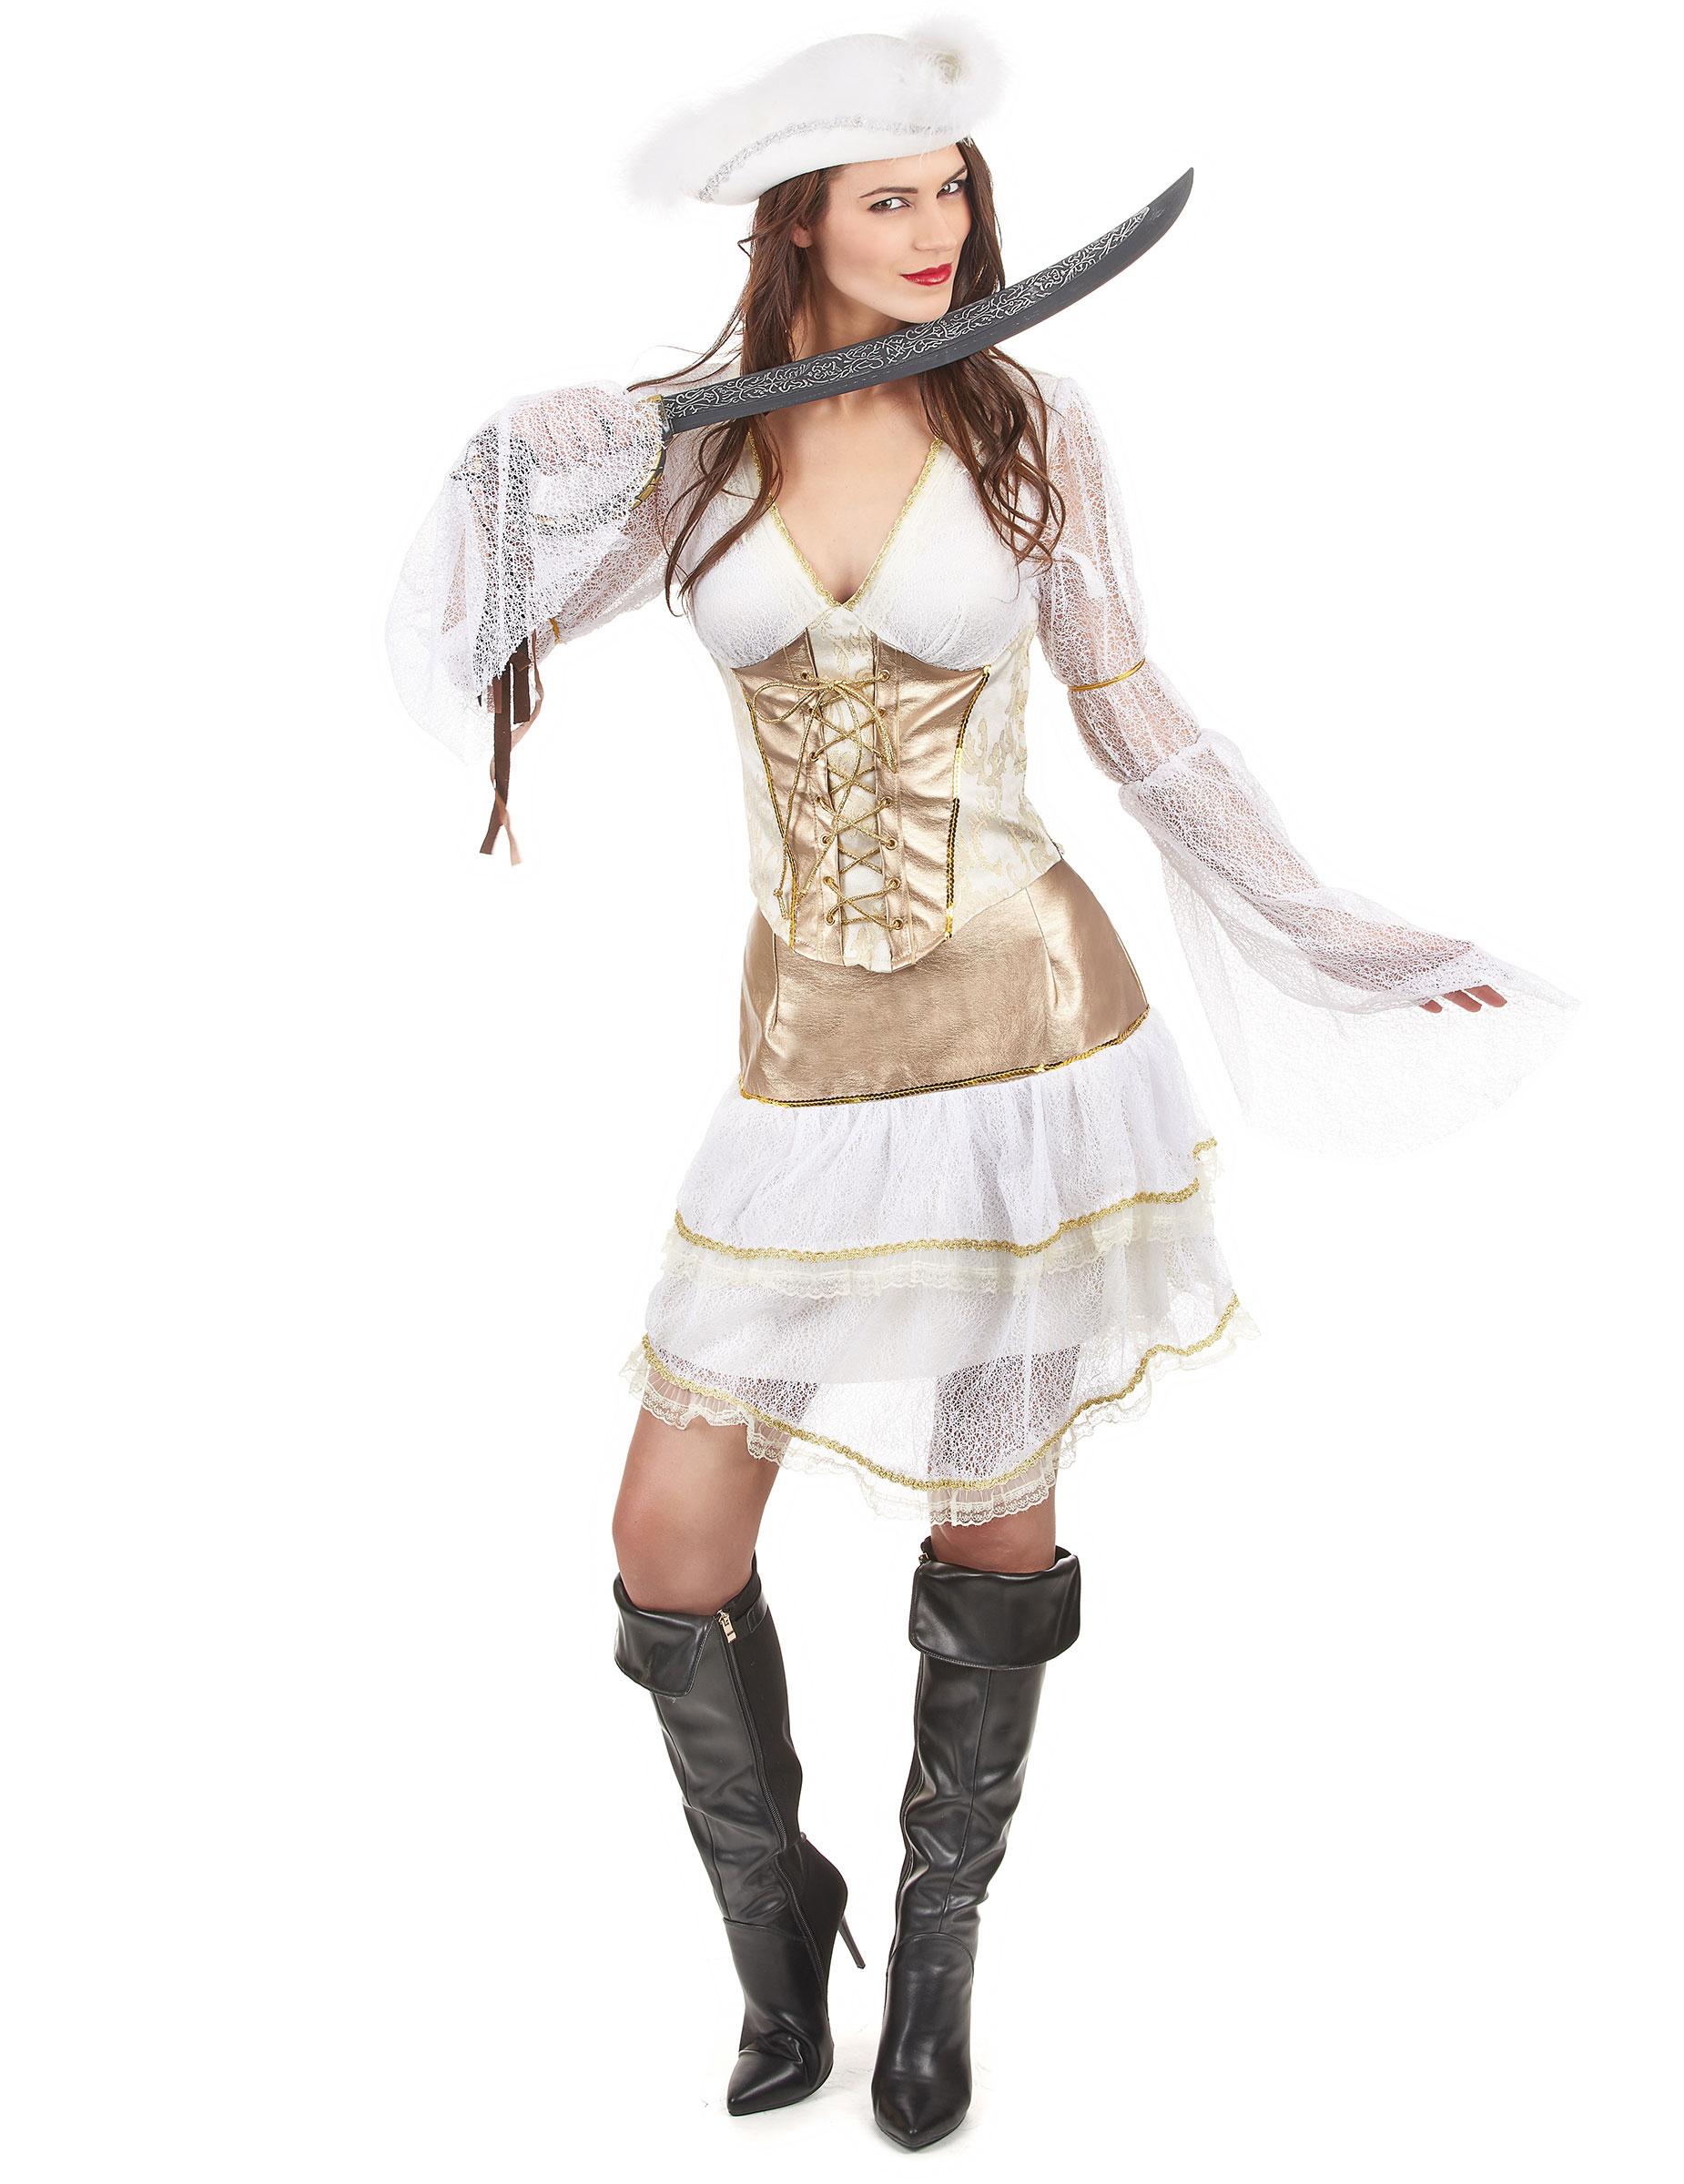 Disfraz de Pirata DisfracesMimocom